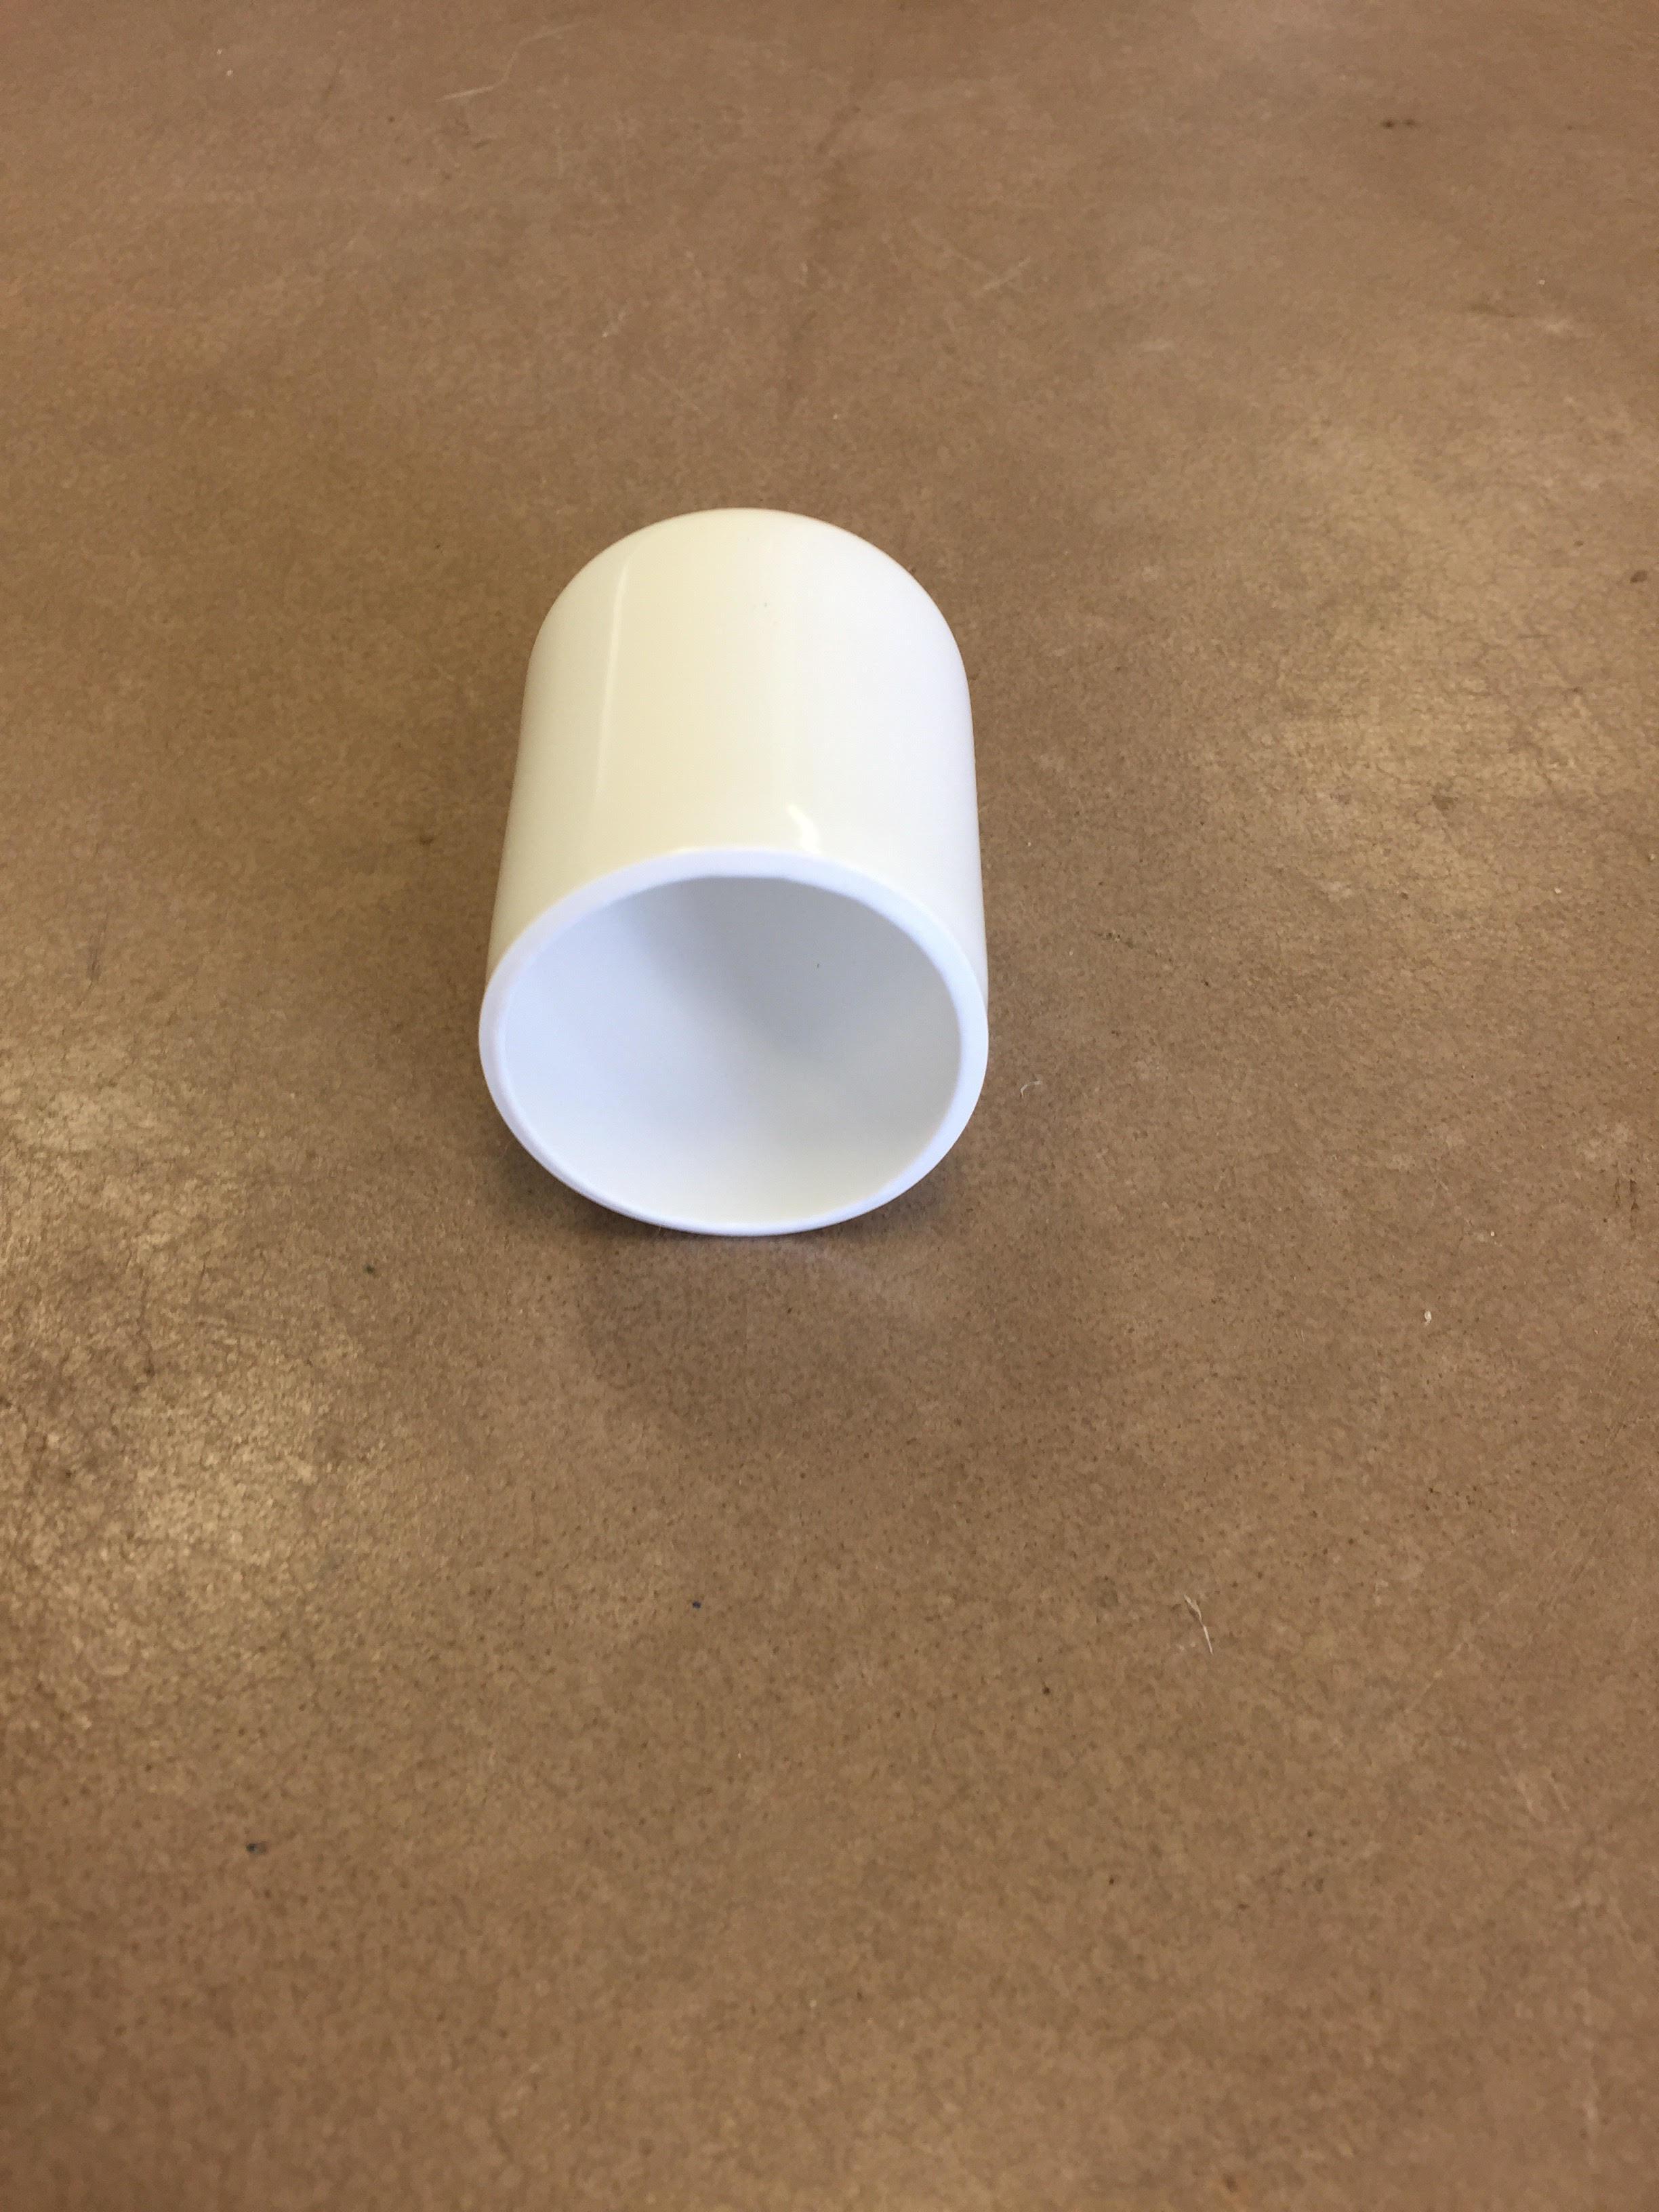 Rubber dock pipe cap